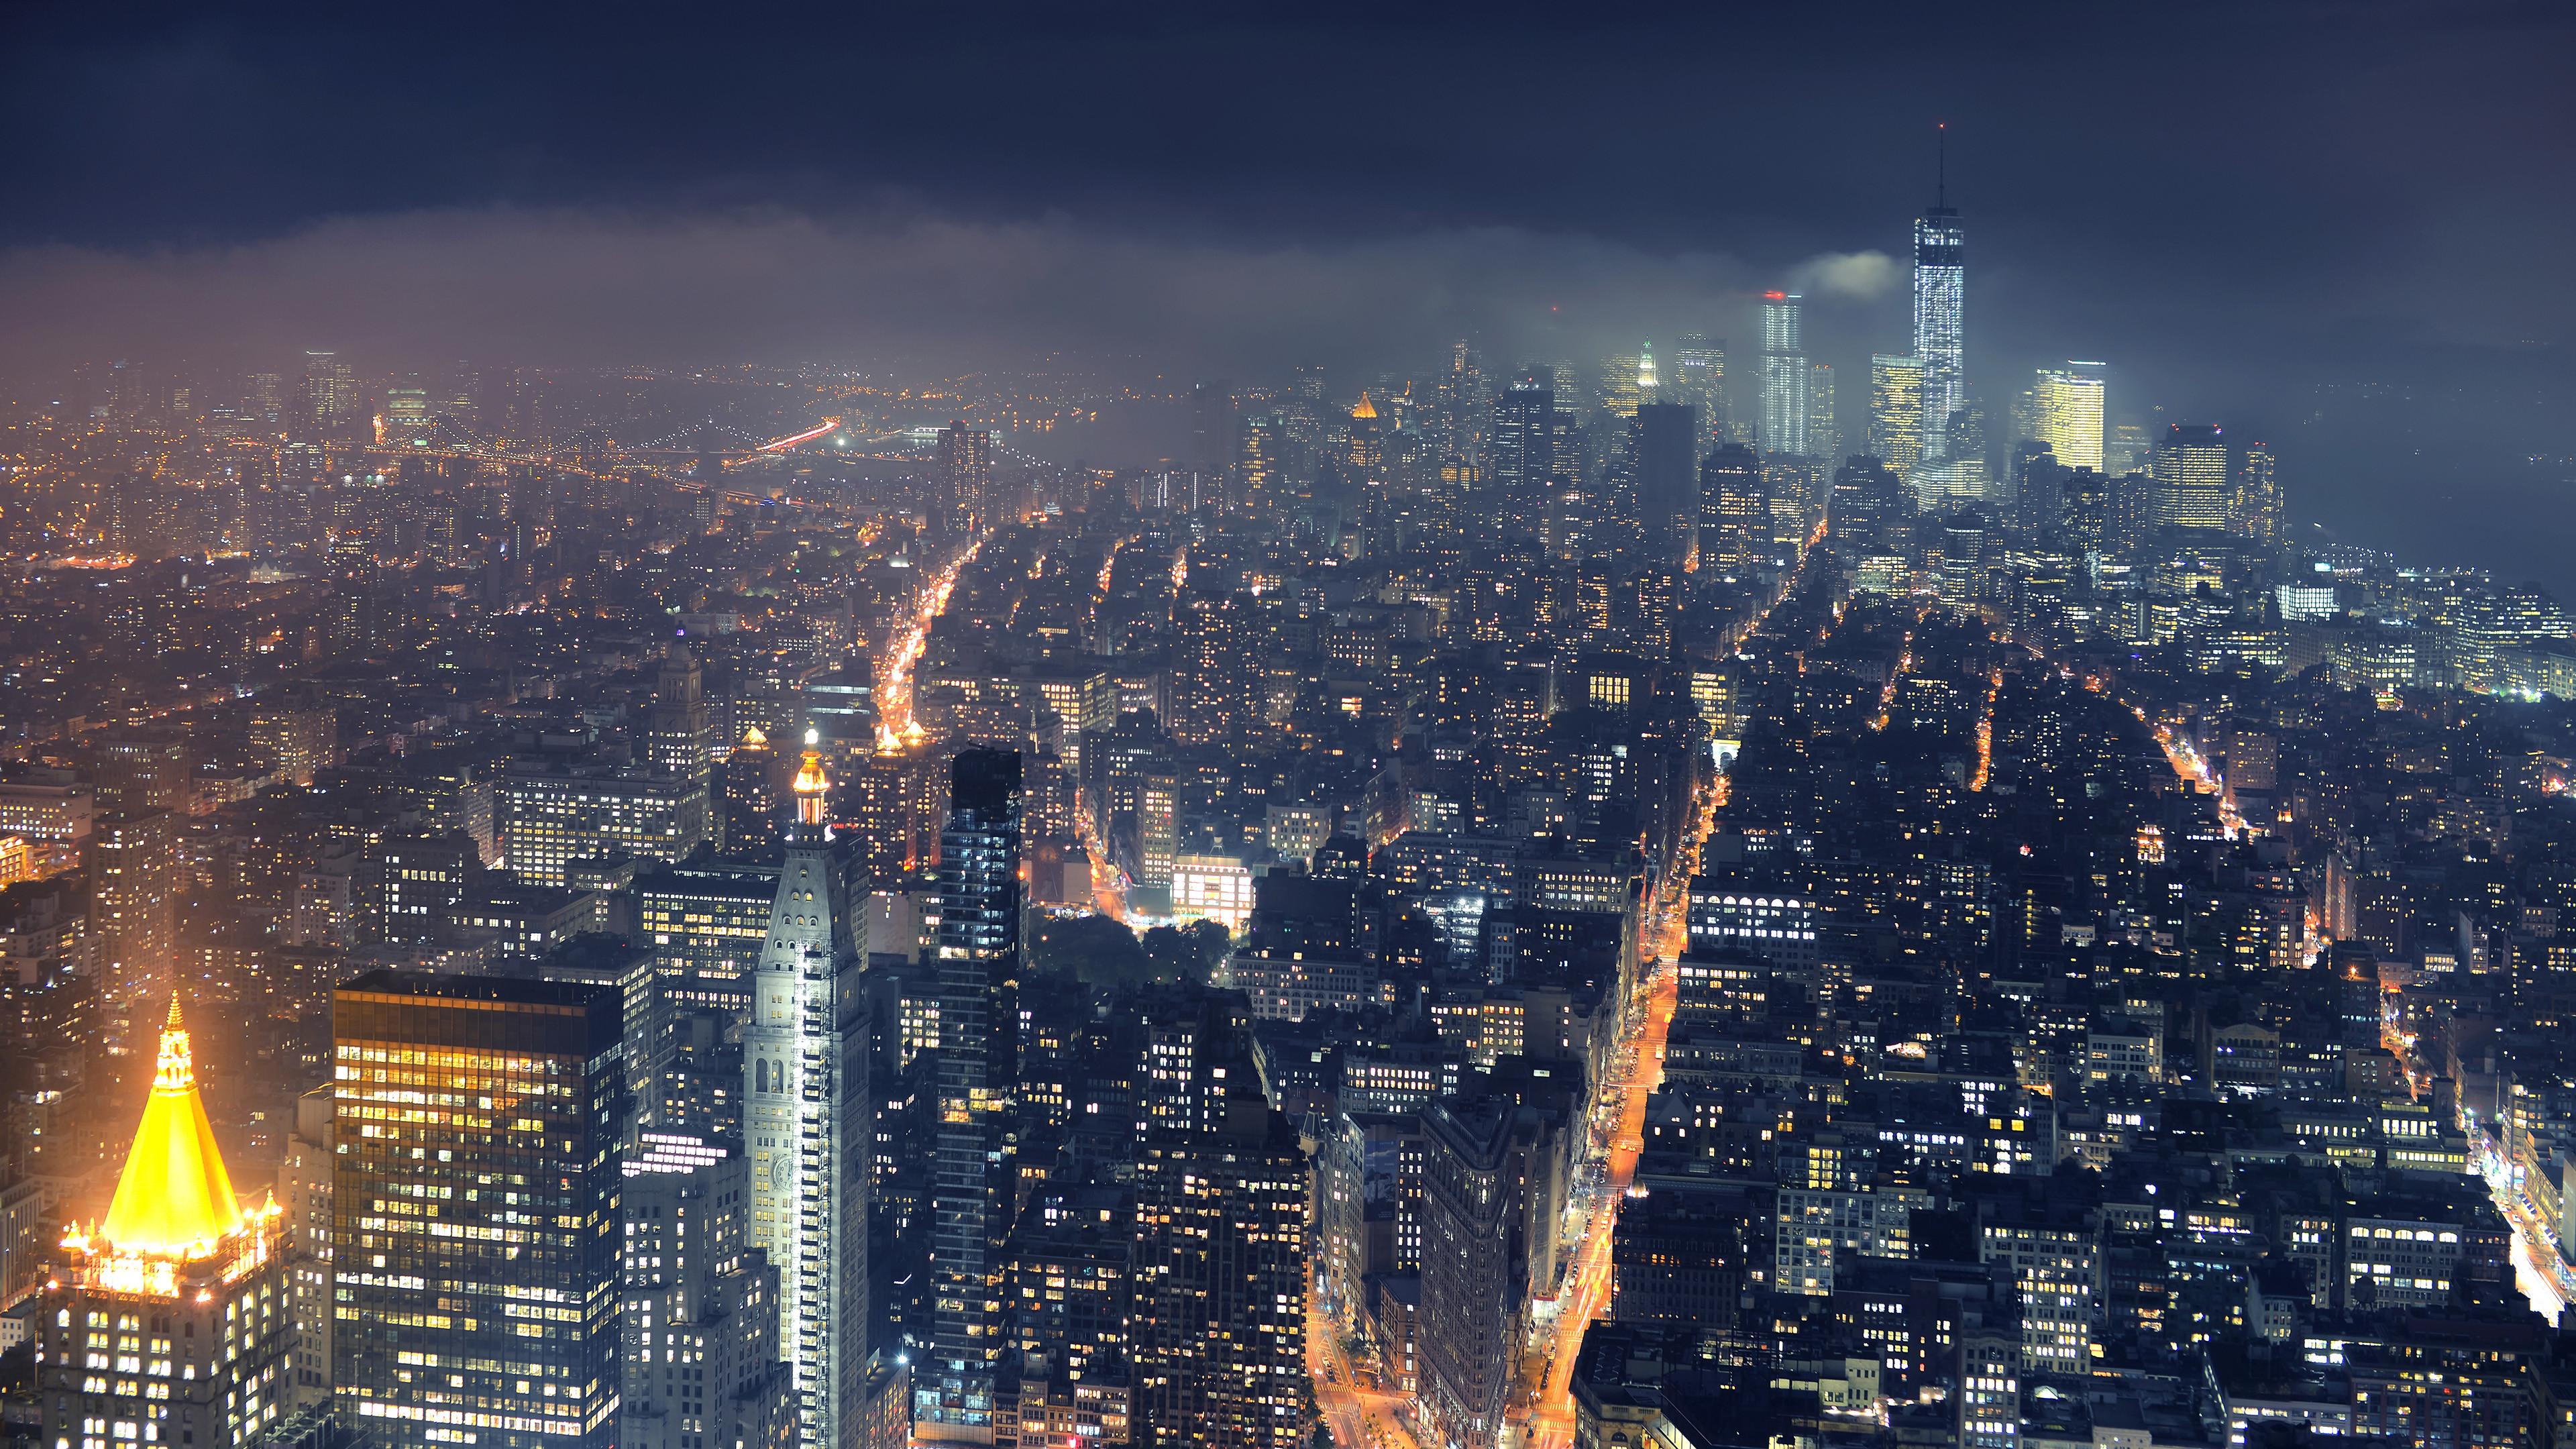 High-resolution desktop wallpaper Gotham City by Dominic Kamp